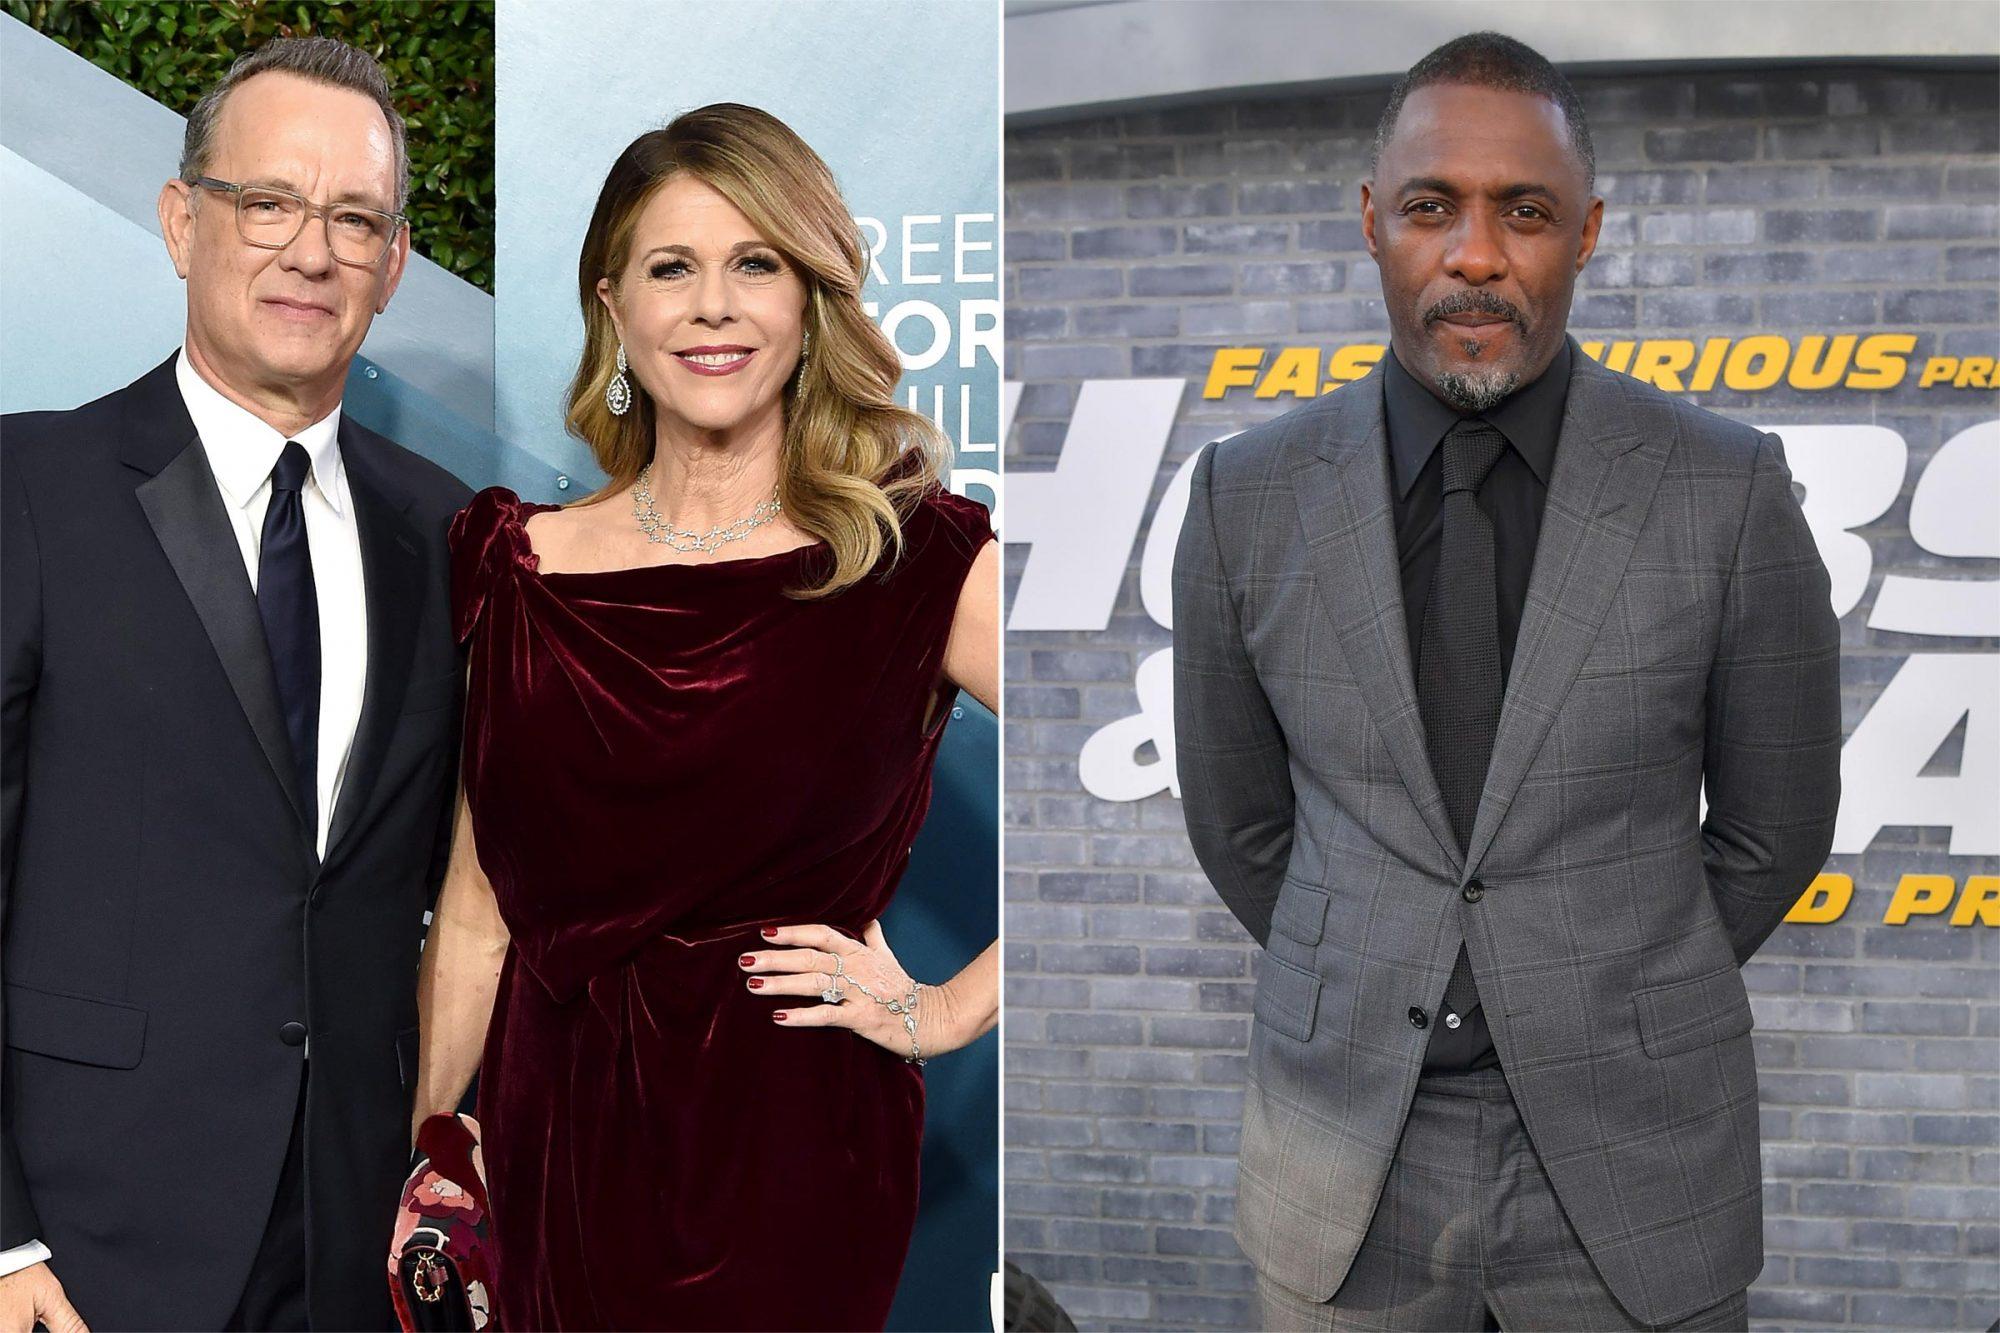 Tom Hanks and Rita Wilson, Idris Elba